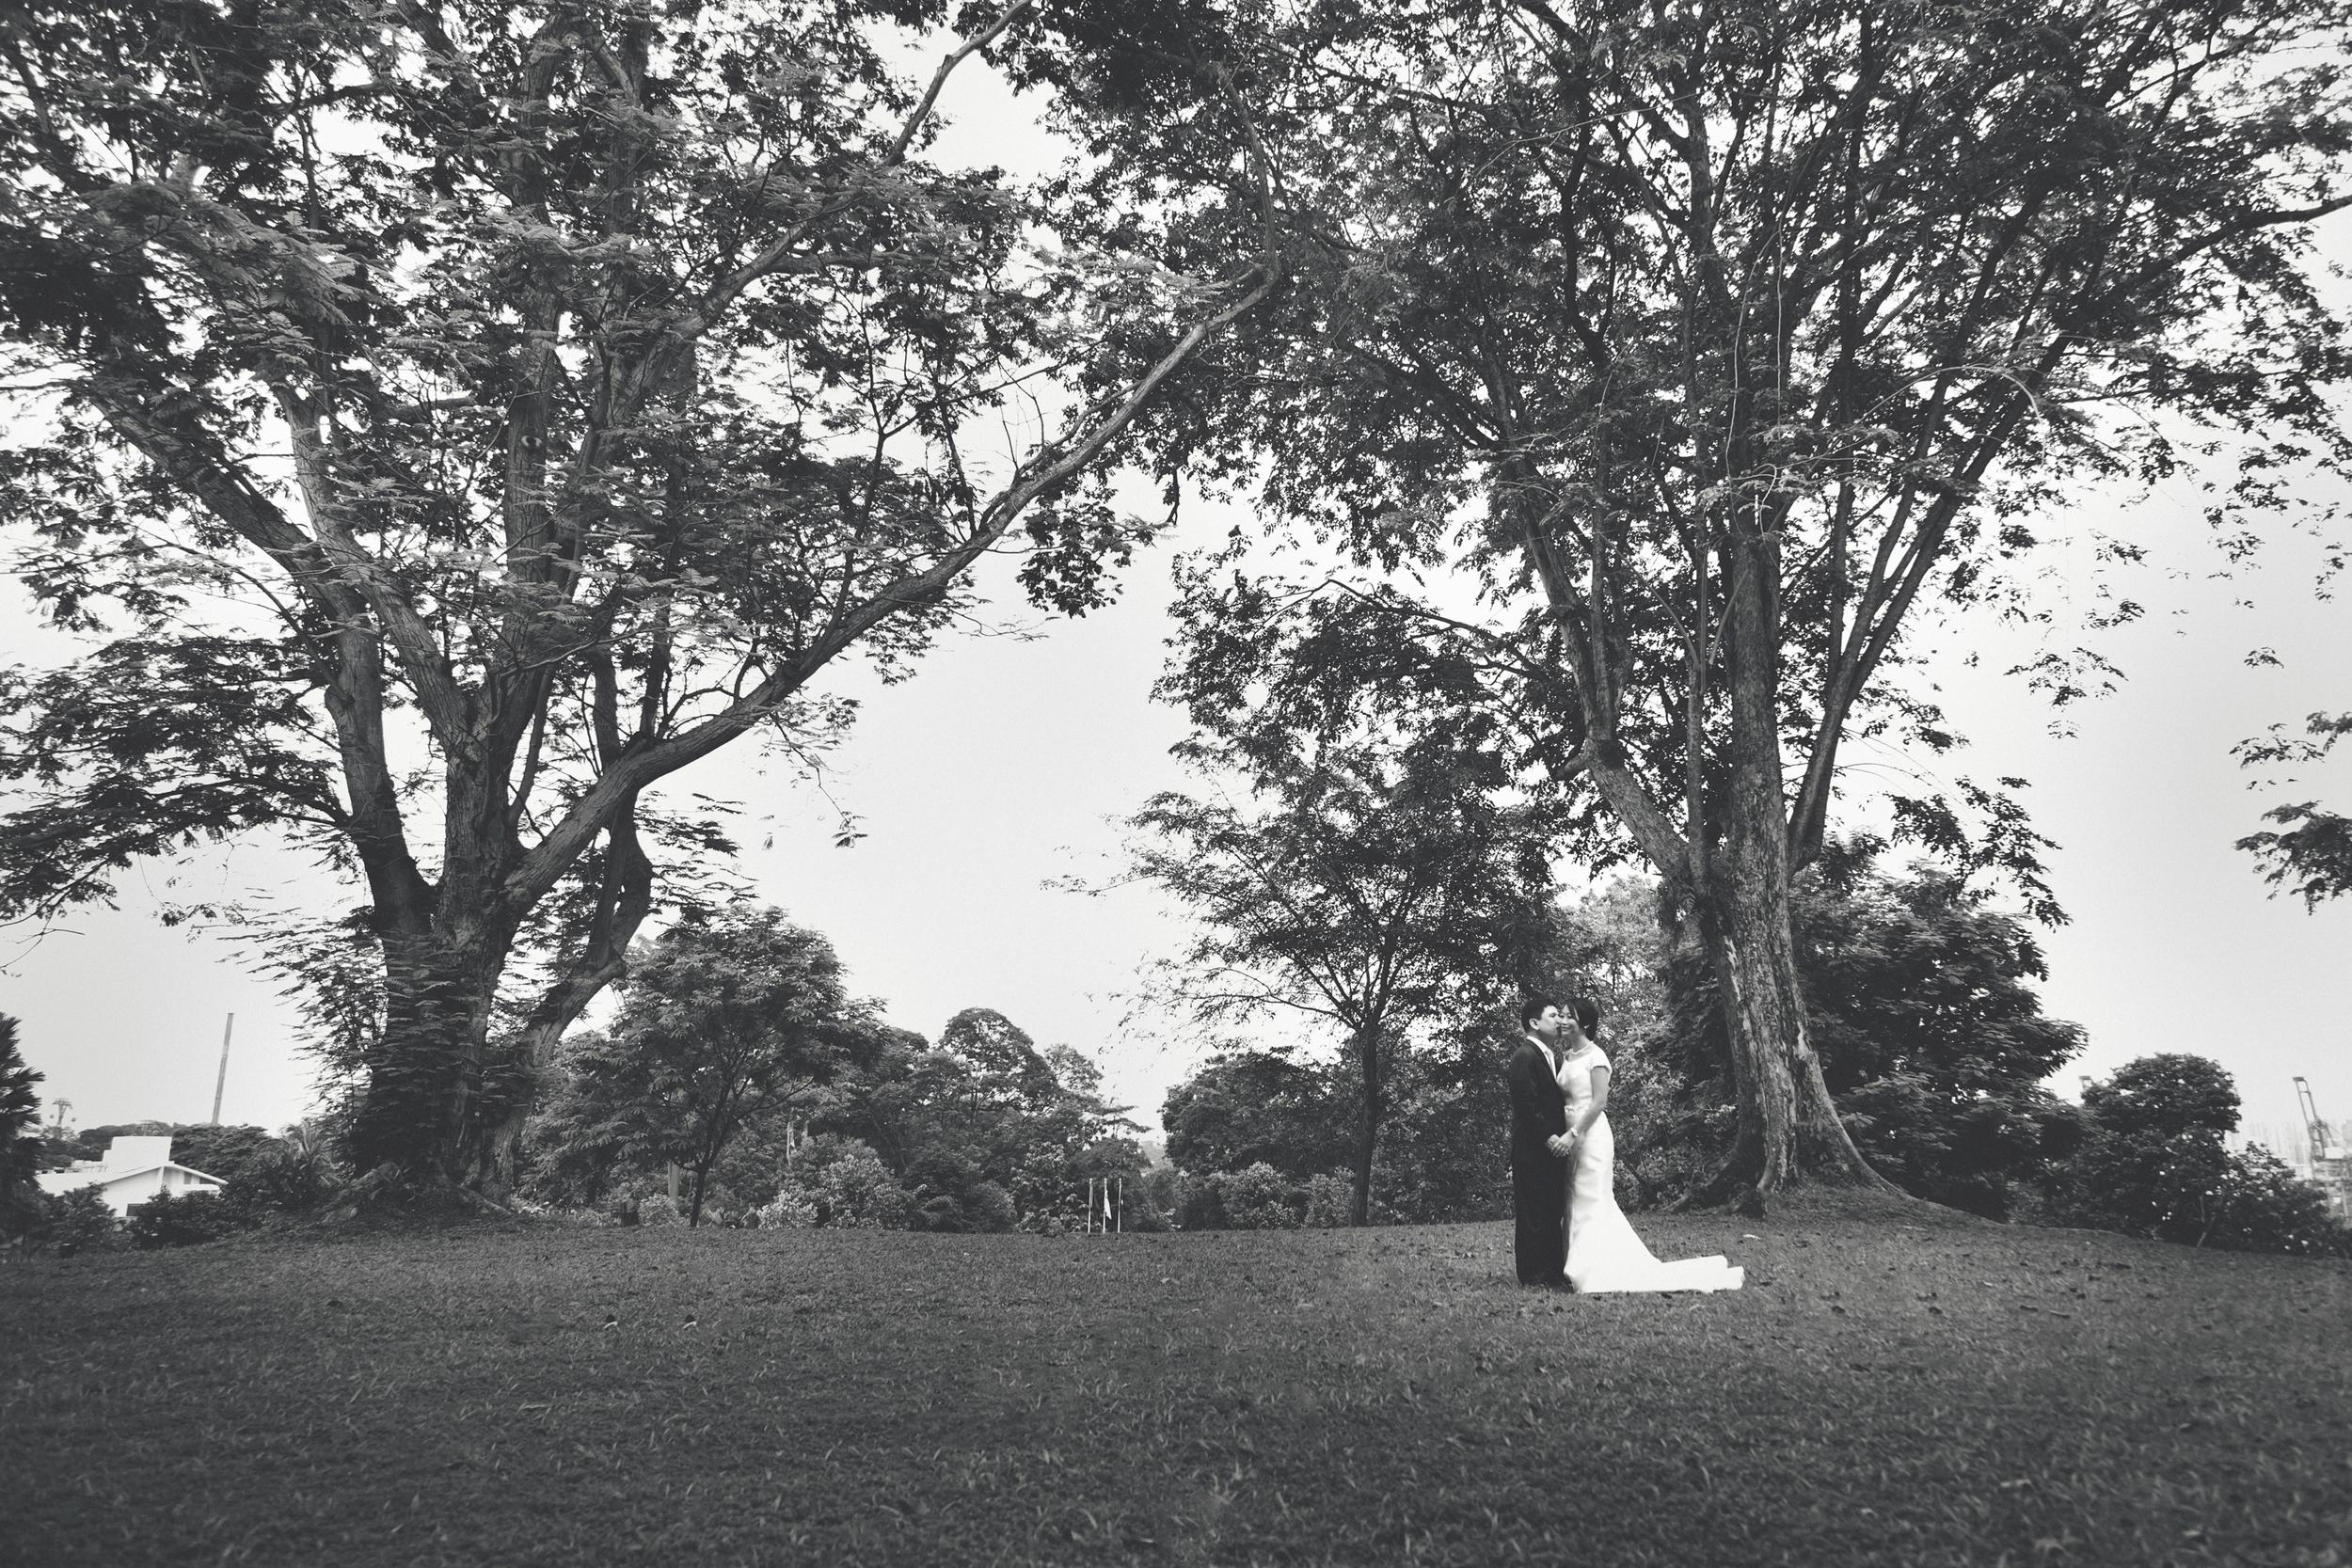 Melisa & Patrick - The Wedding - Highlights - 112.jpg